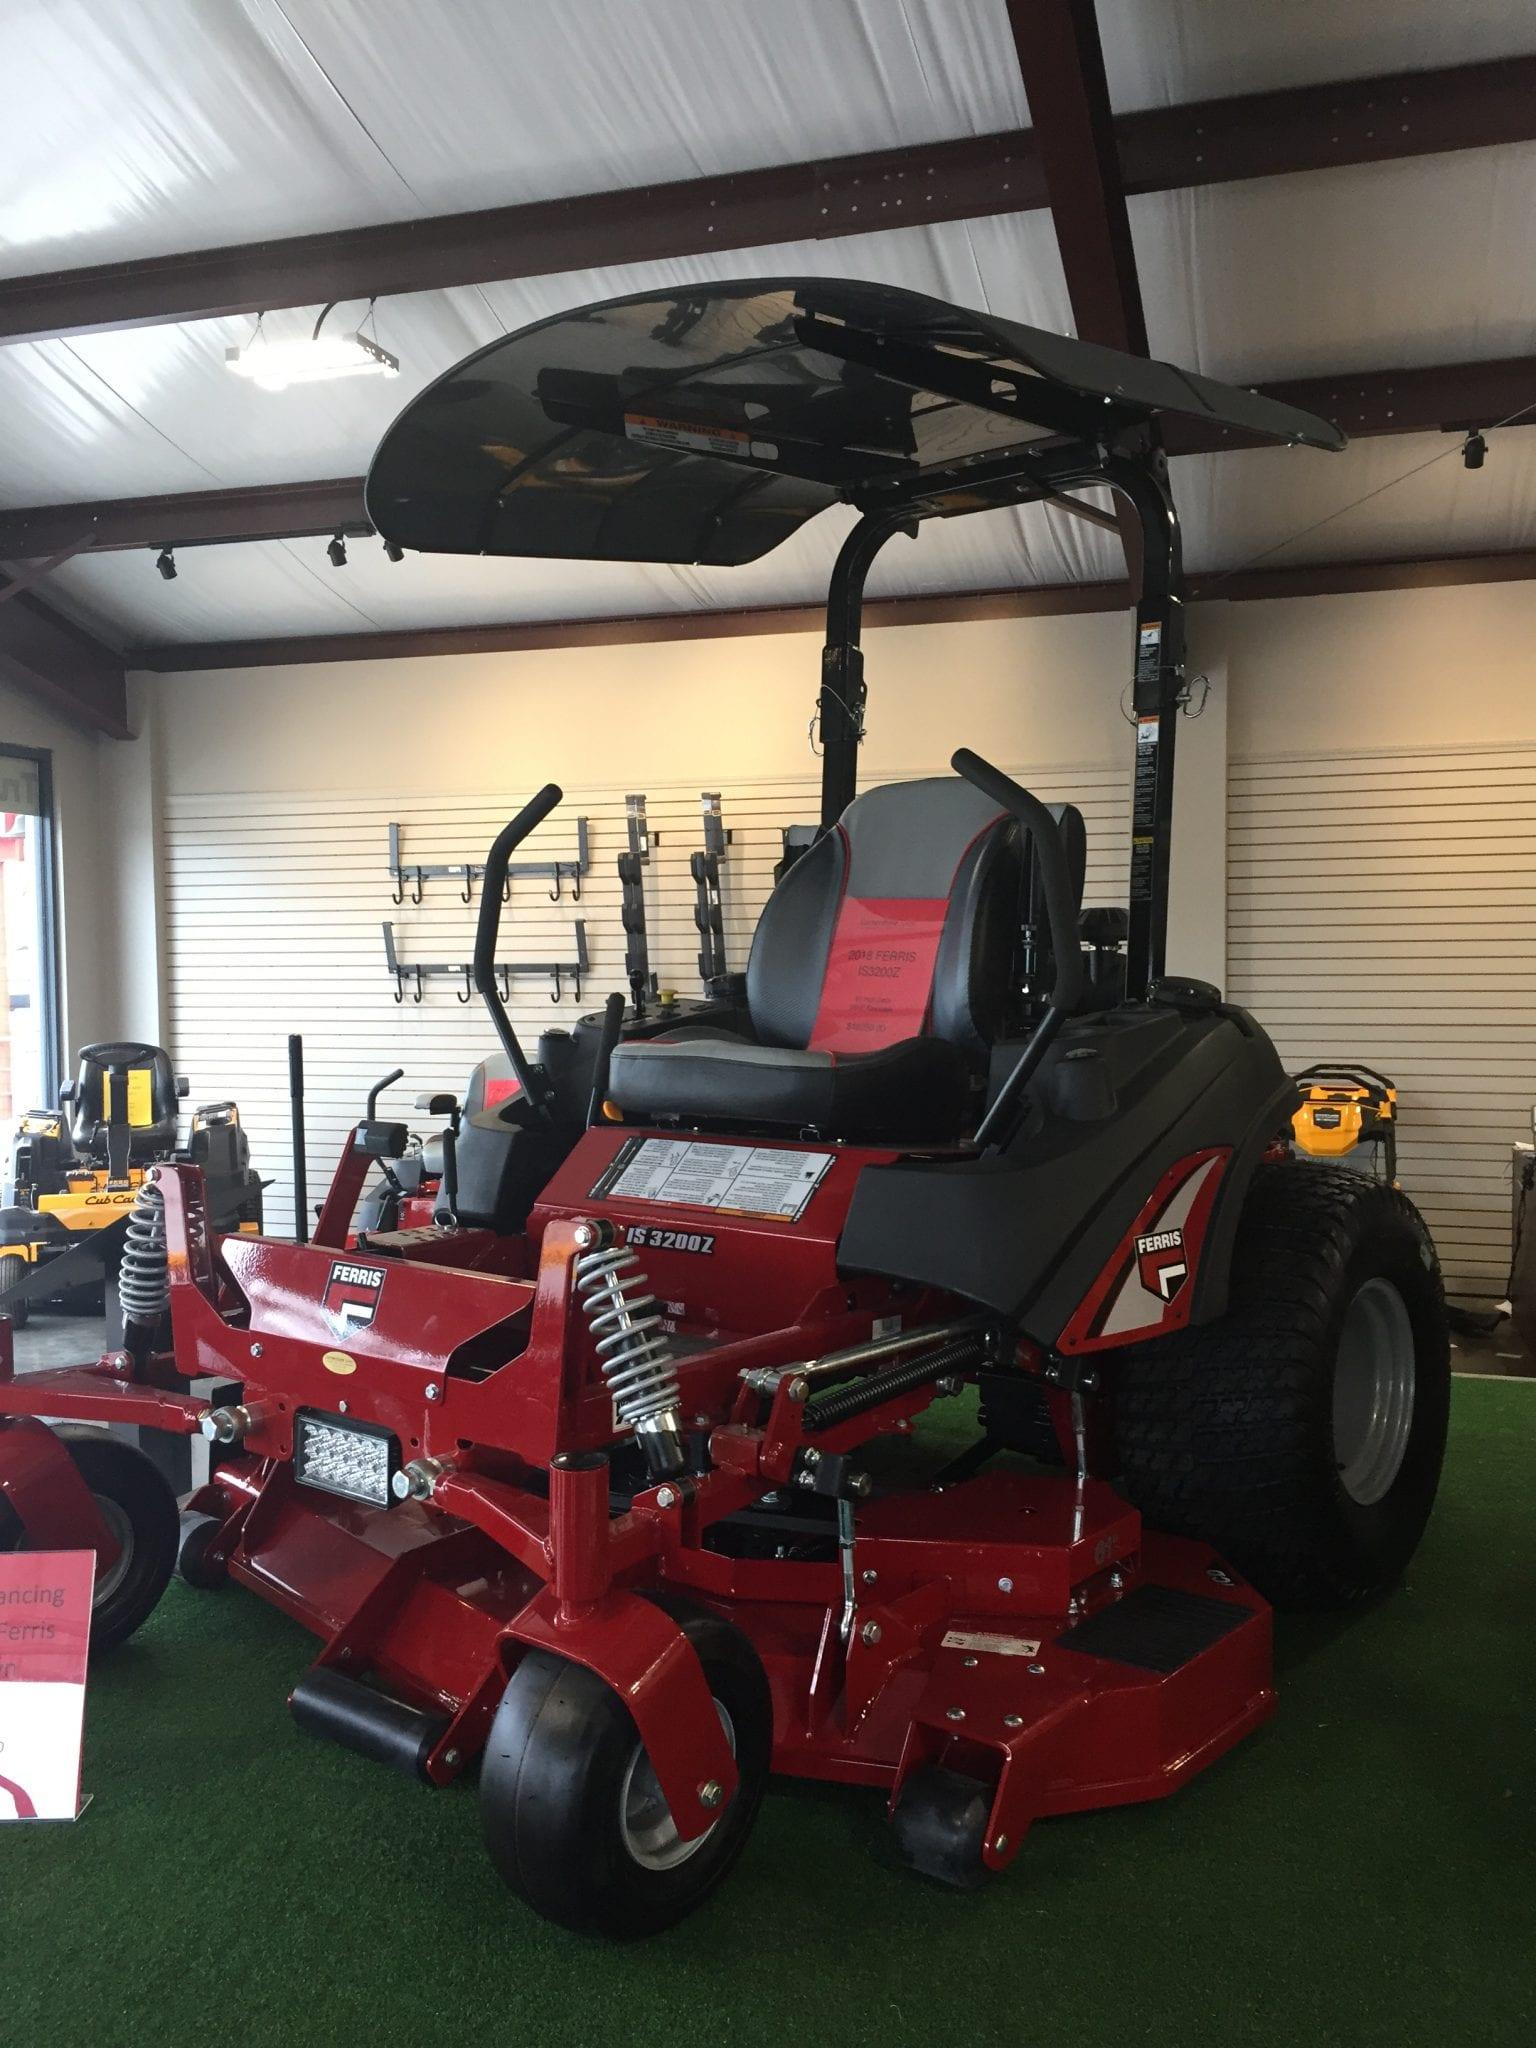 Ferris IS 3200 Z - Cornerstone Equipment Sales